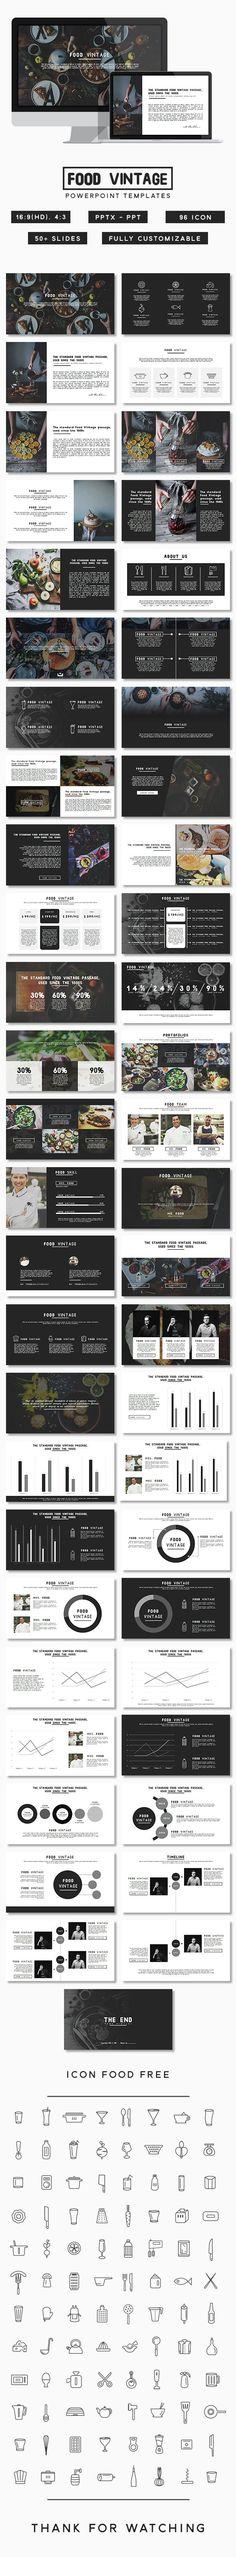 Food Vintage Presentation (PowerPoint Templates)